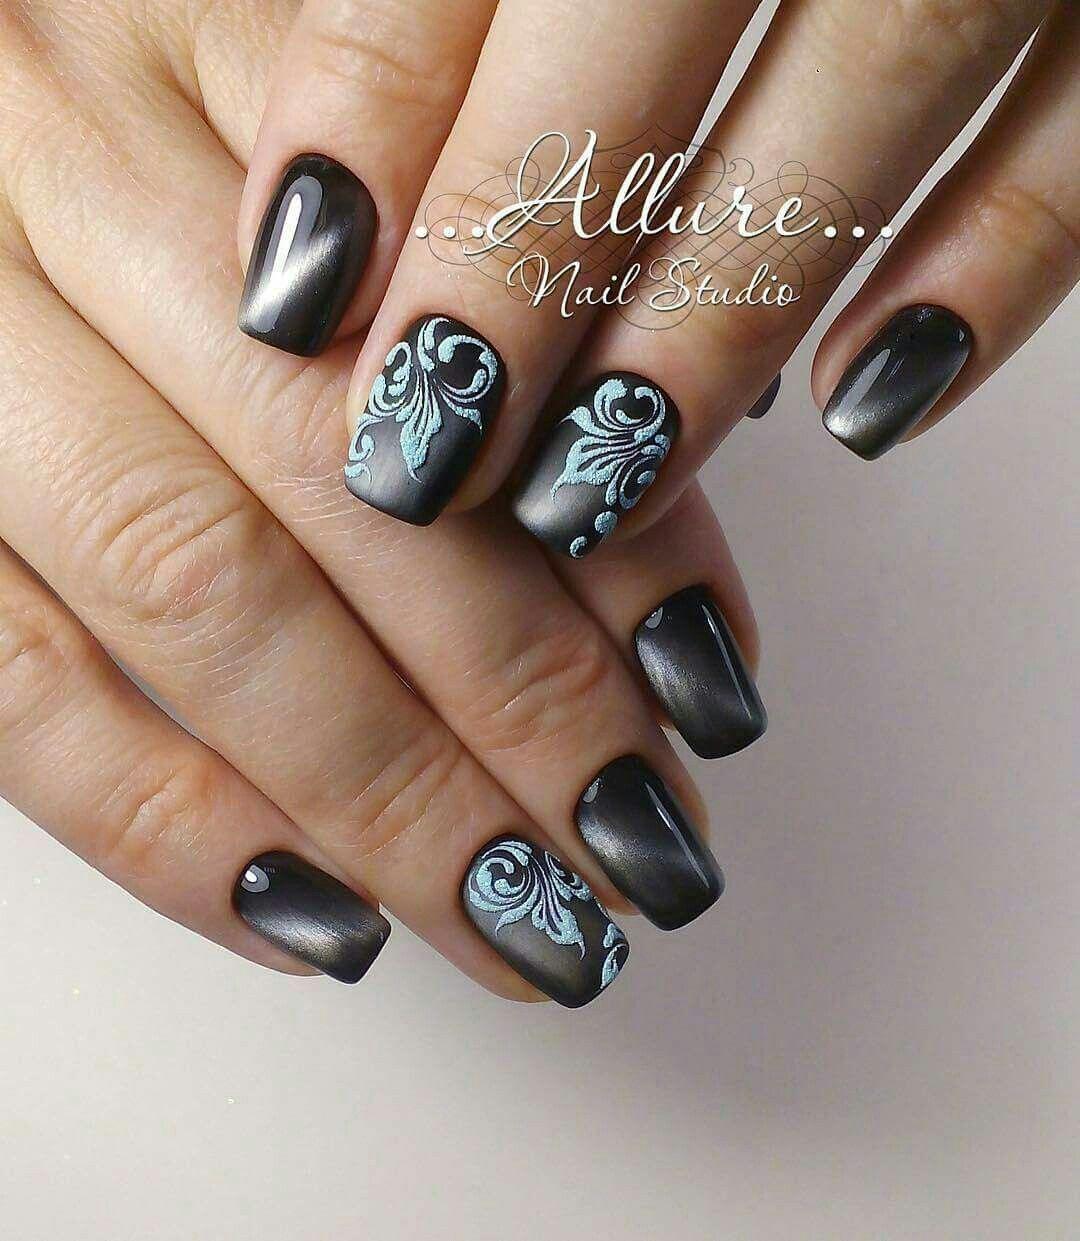 Alluring Fingernägel Design Bilder Reference Of Fingernägel Design, Nagelschere, Einfache Nägel, Elegante Nägel,